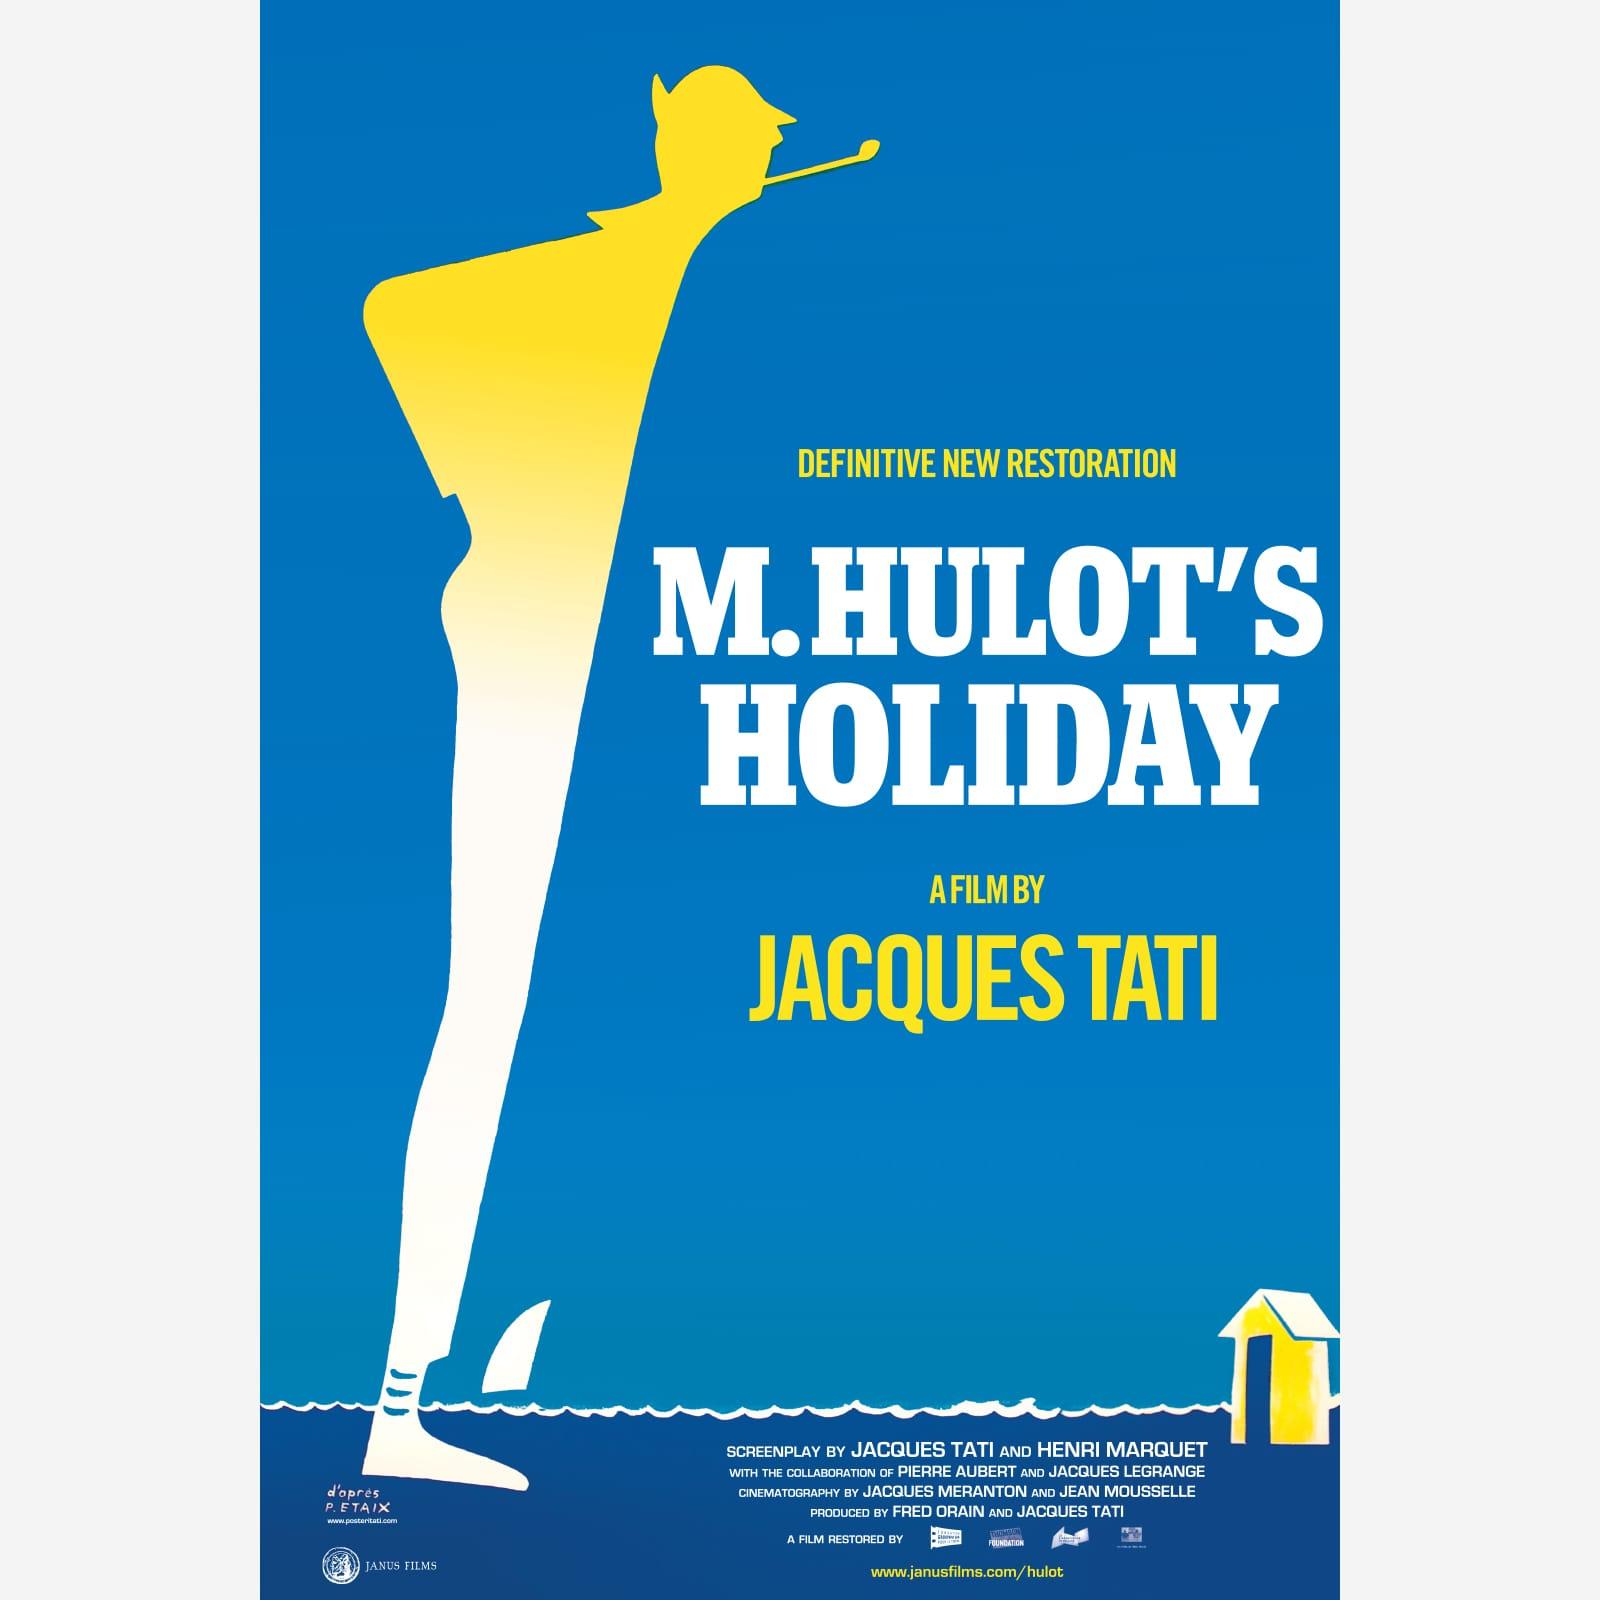 M. Hulot's Holiday Poster